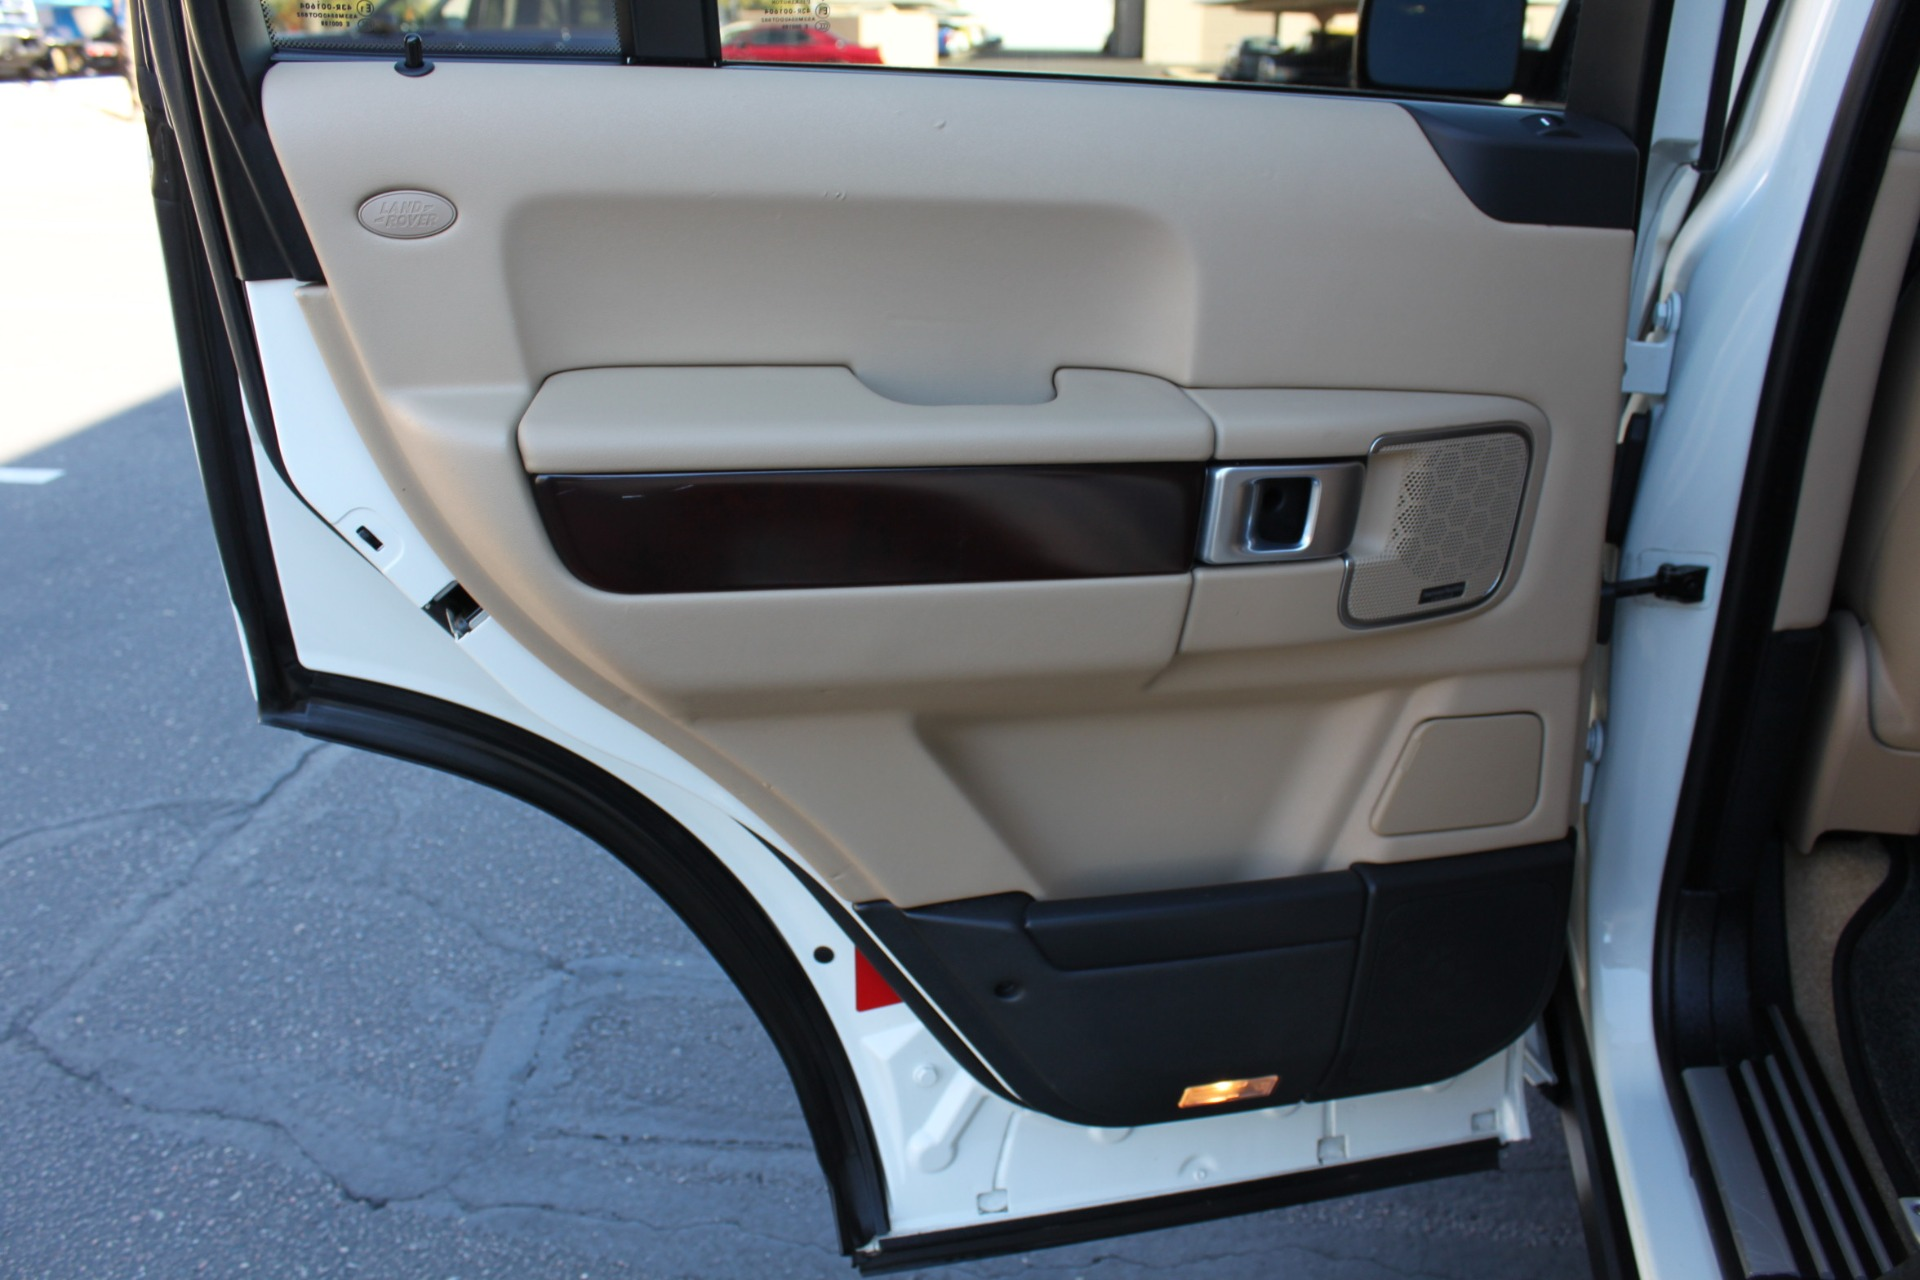 Used-2007-Land-Rover-Range-Rover-HSE-Lexus